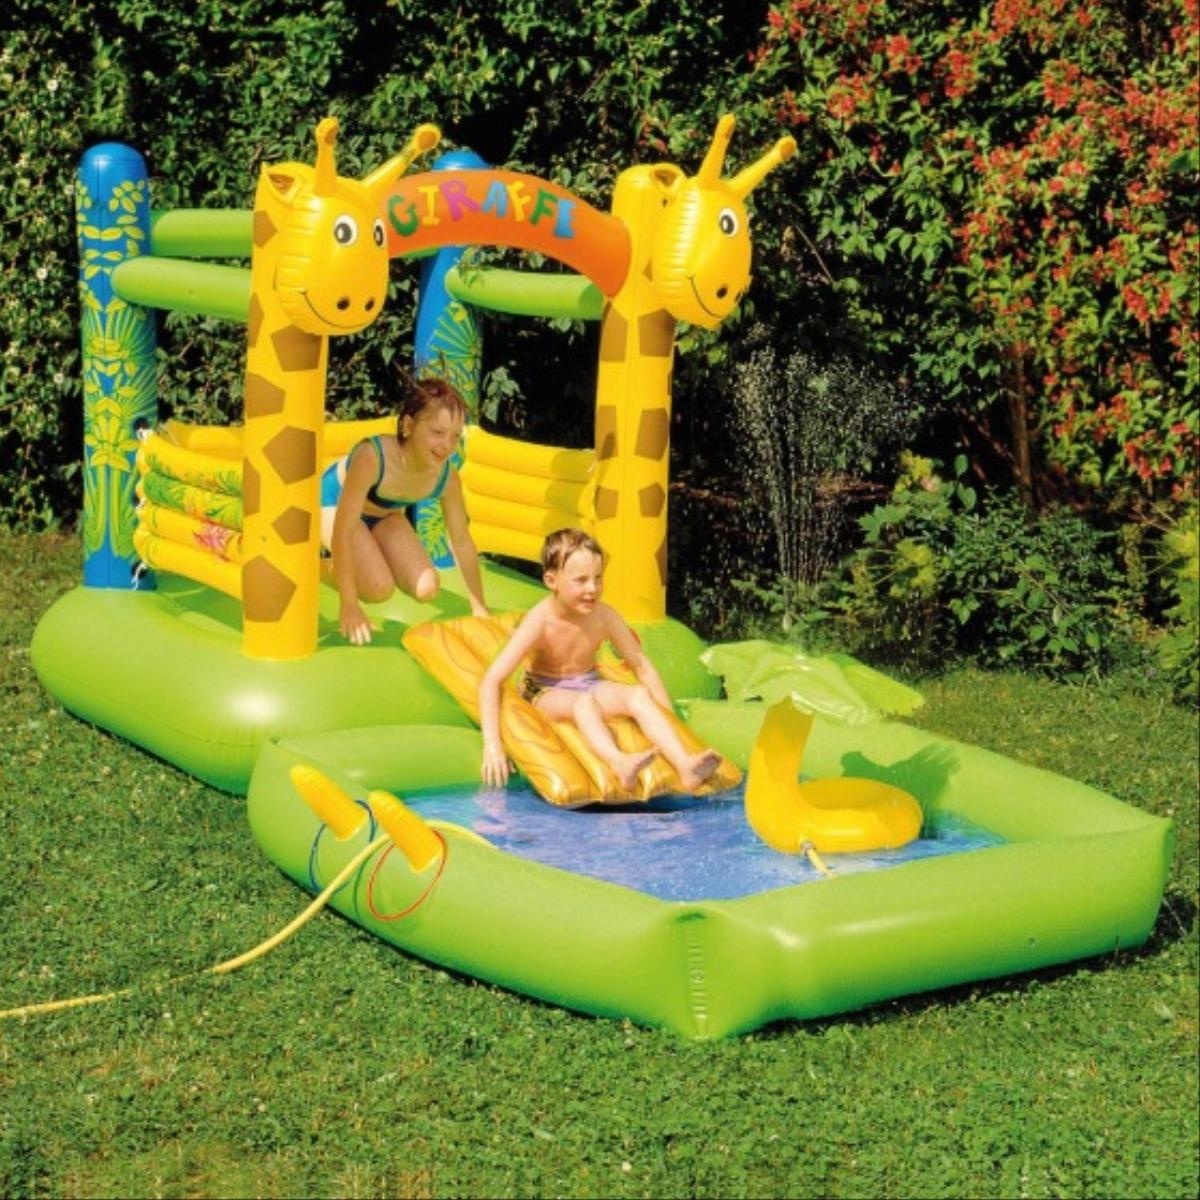 H�pfburg+Pool Giraffe m.Spr�hfunktion